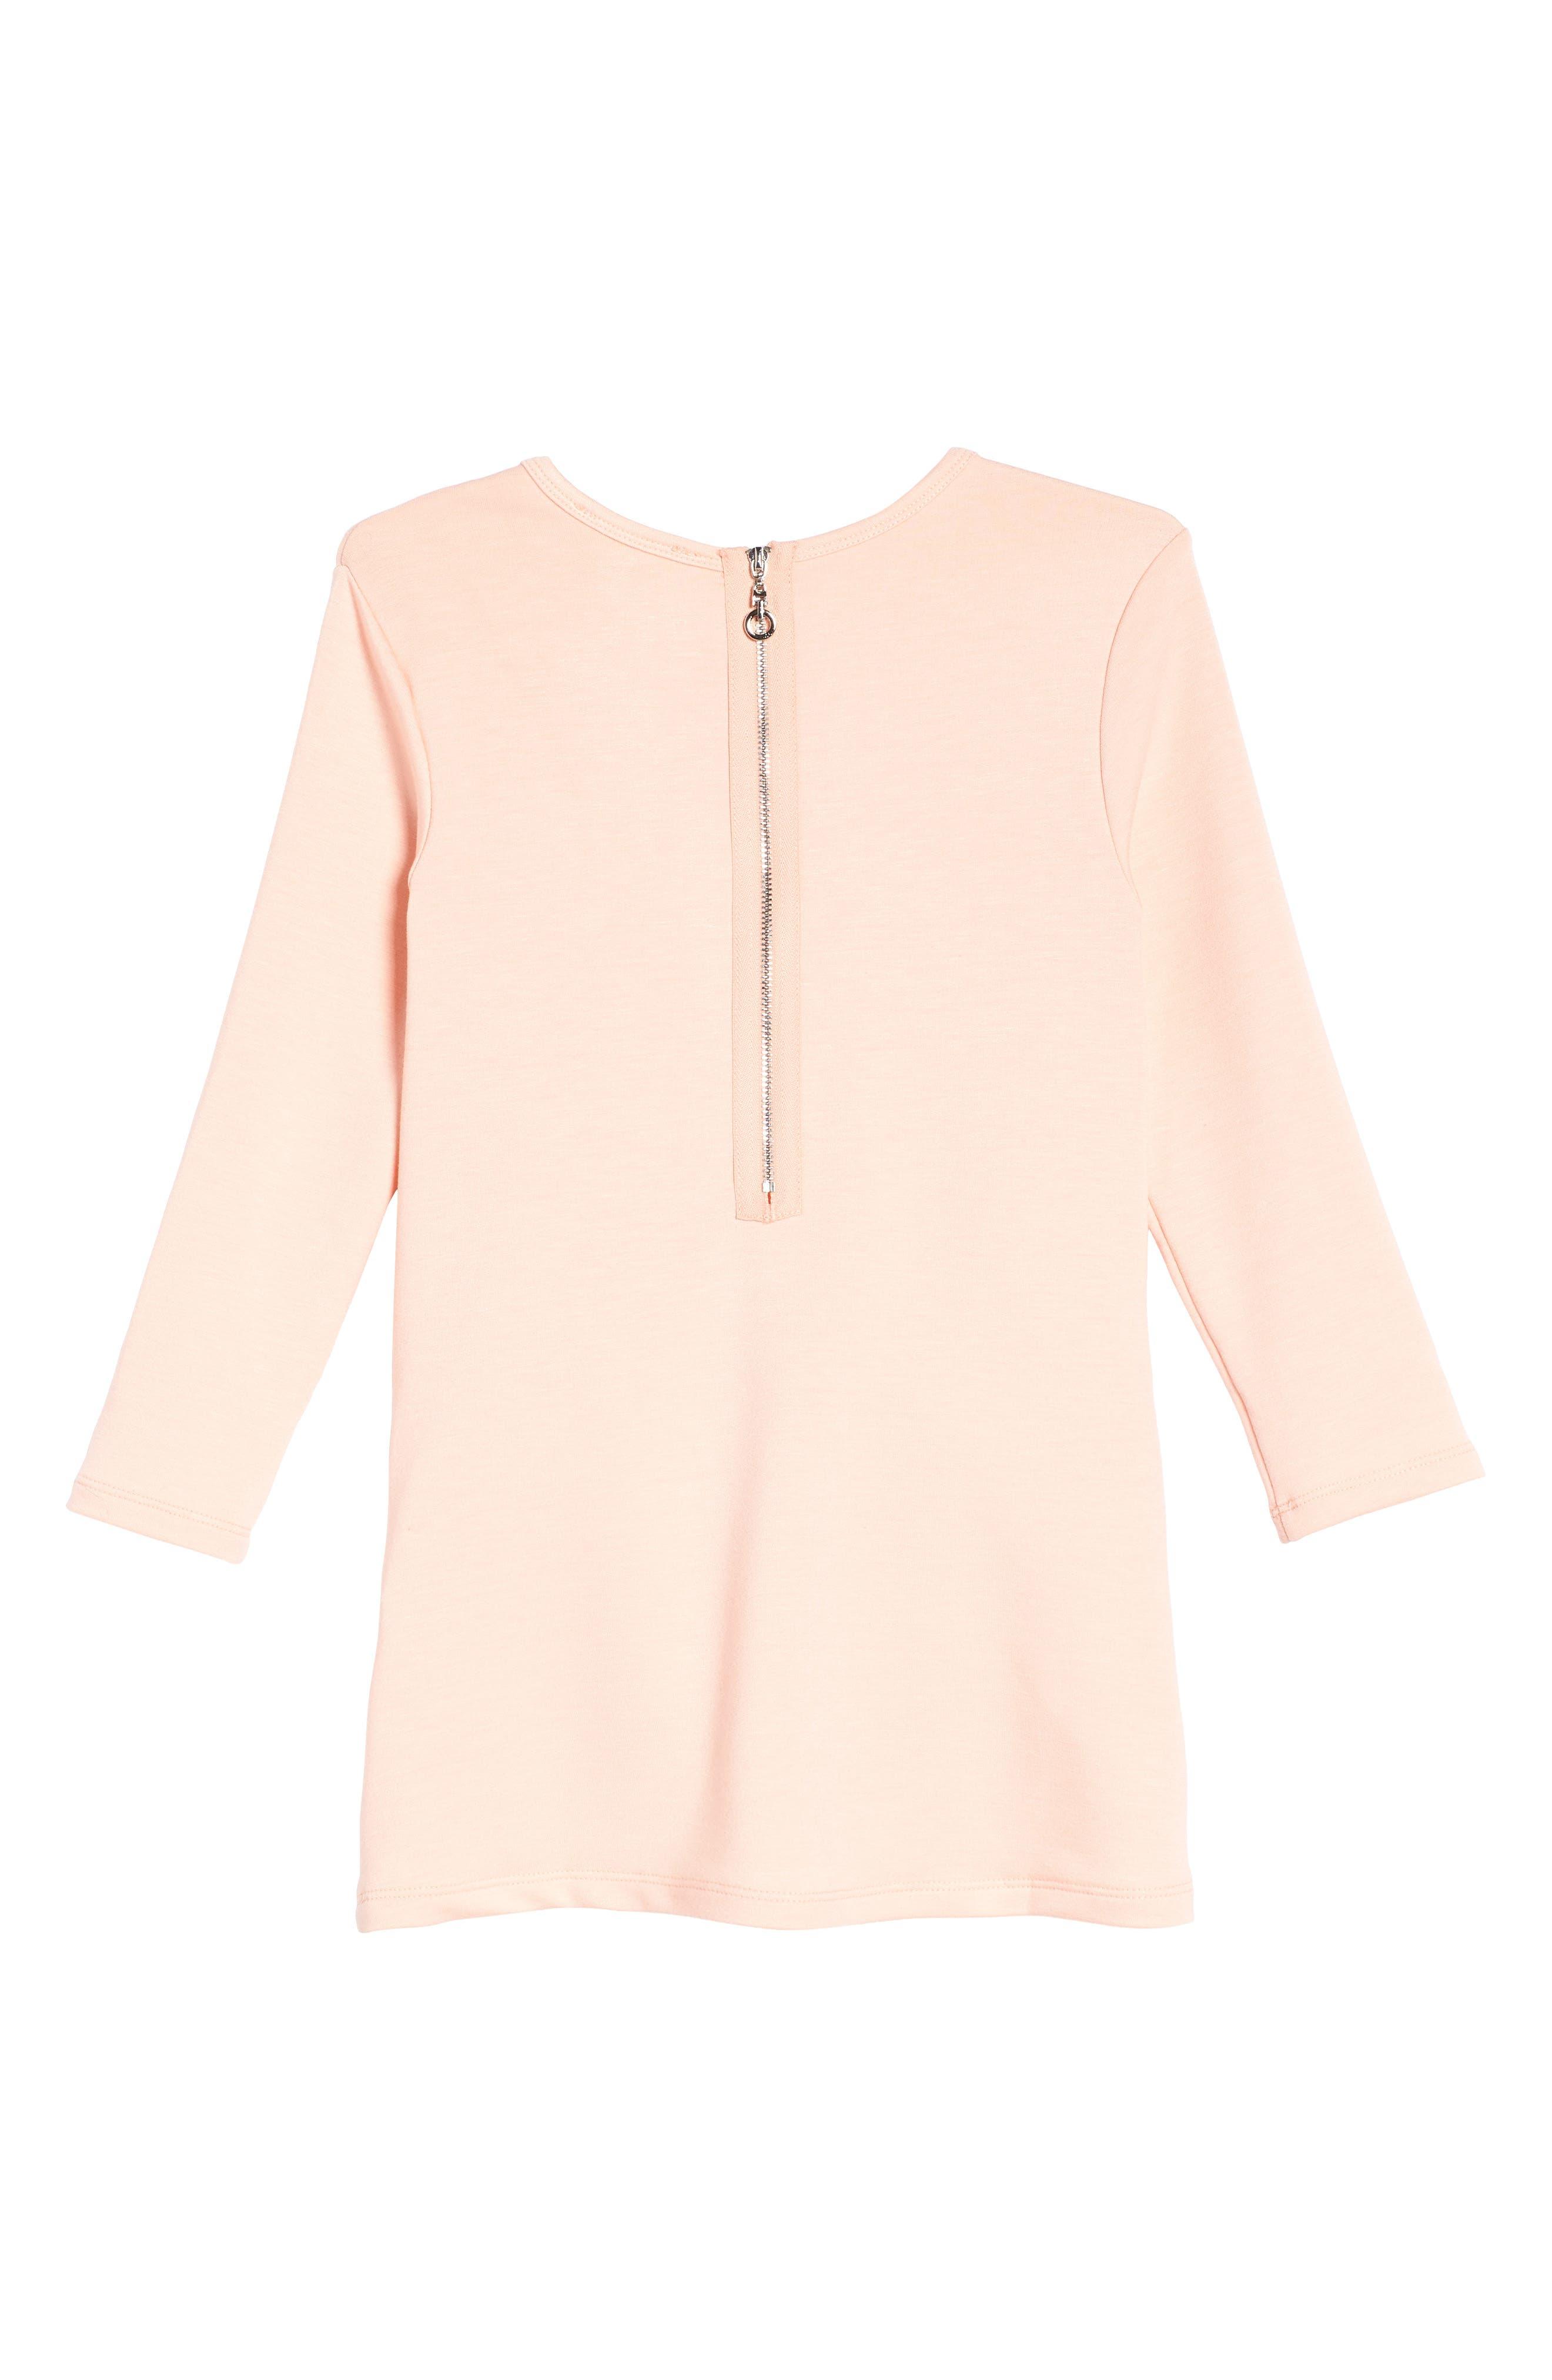 Celestial Knit Dress,                             Alternate thumbnail 2, color,                             Light Pink